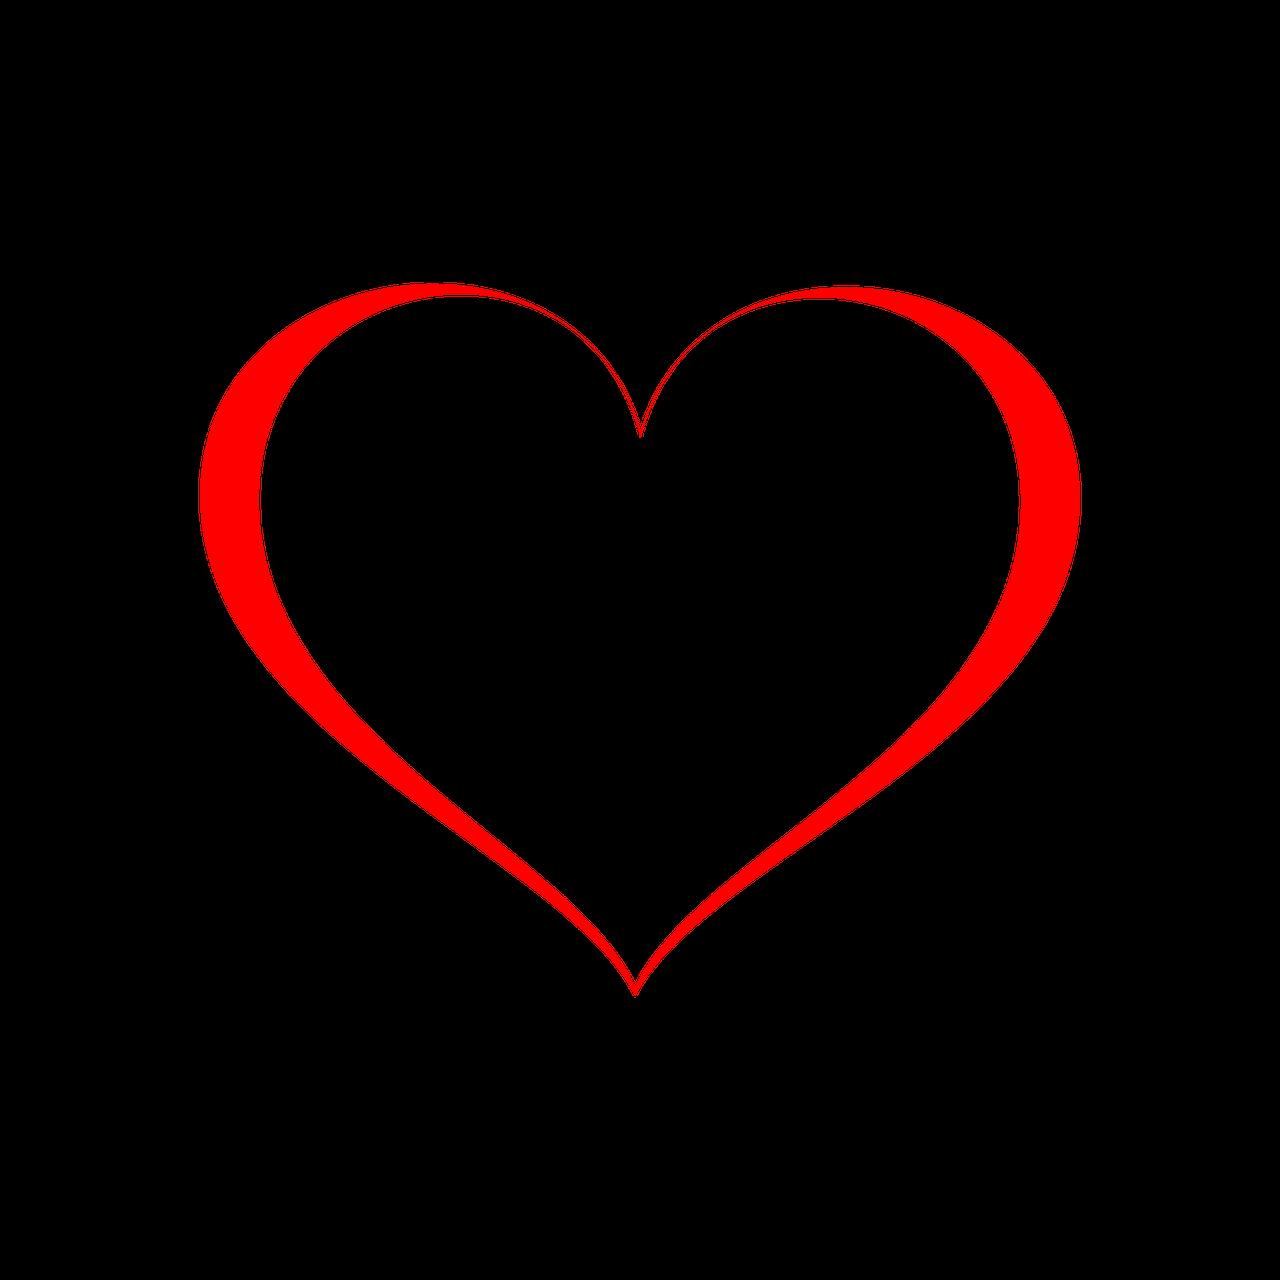 Wedding Heart Icon Symbol Love Red